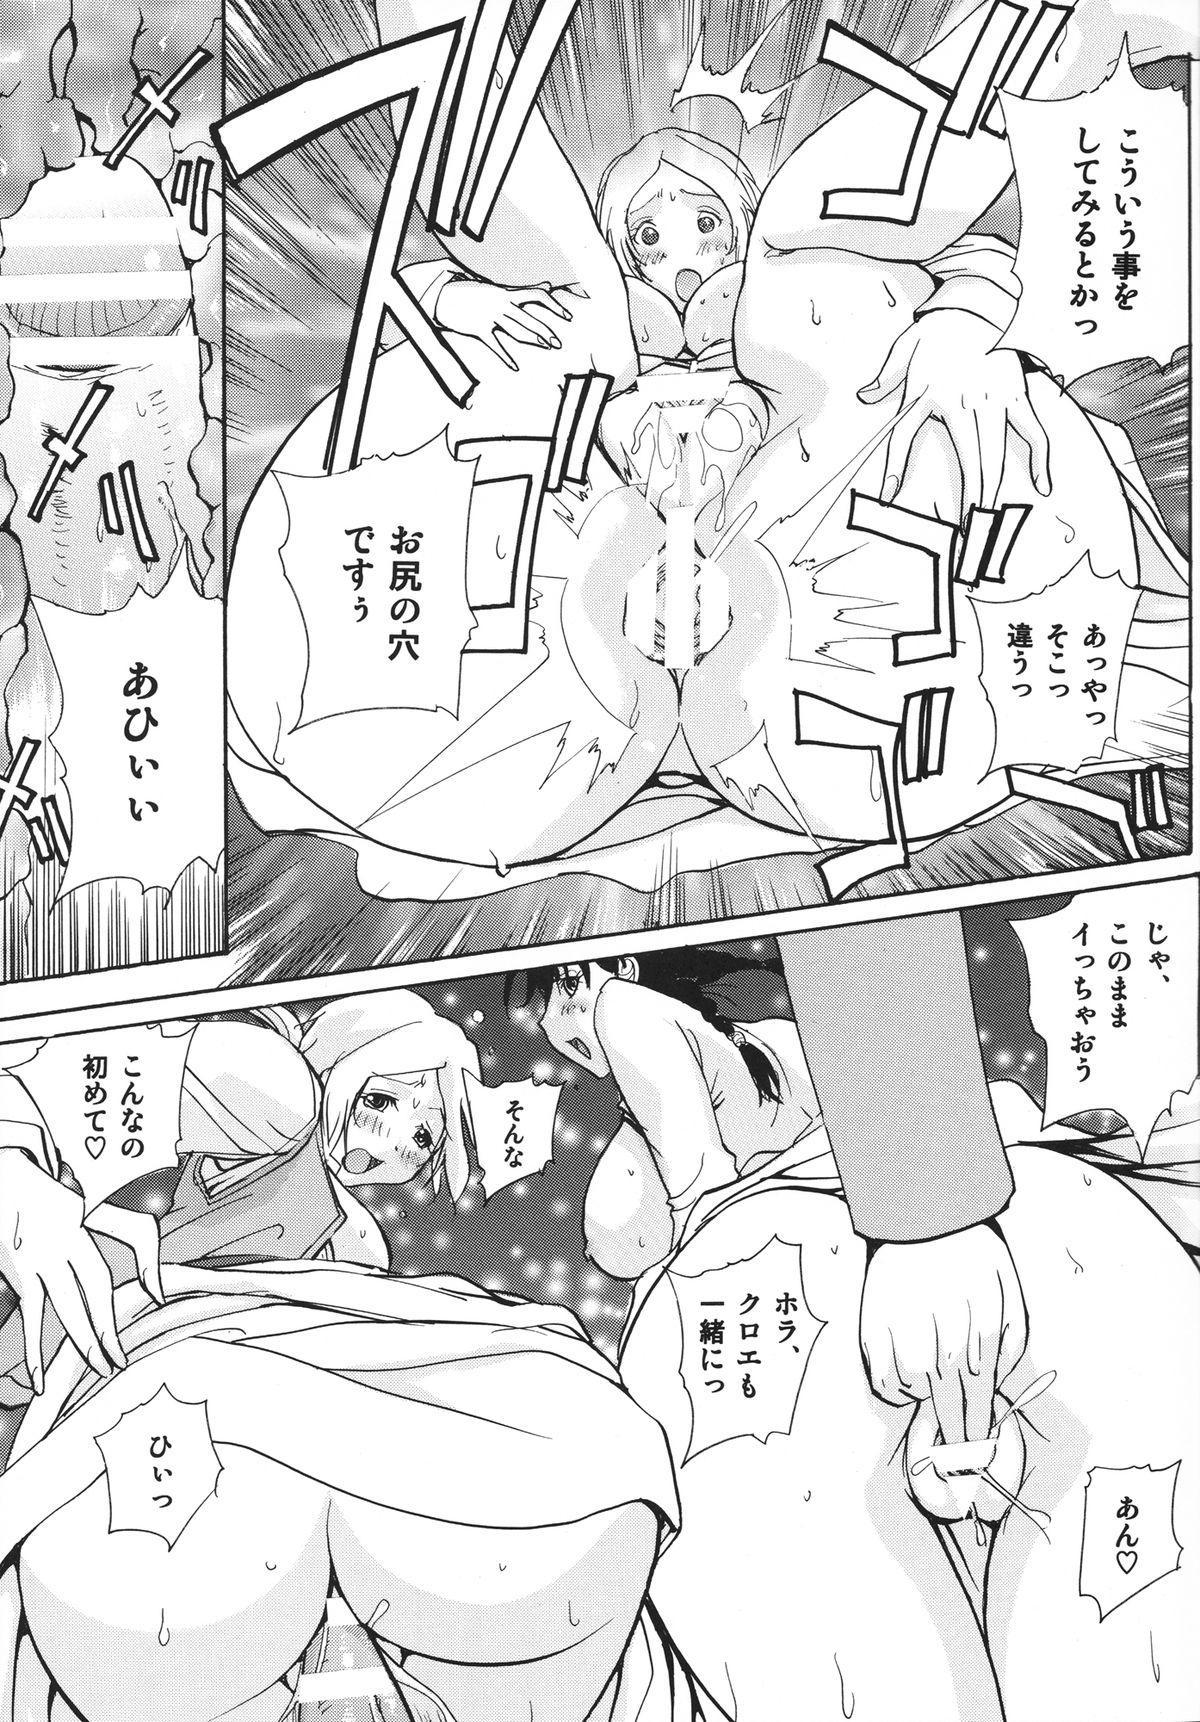 Ookami to Osage to Kohitsuji 11